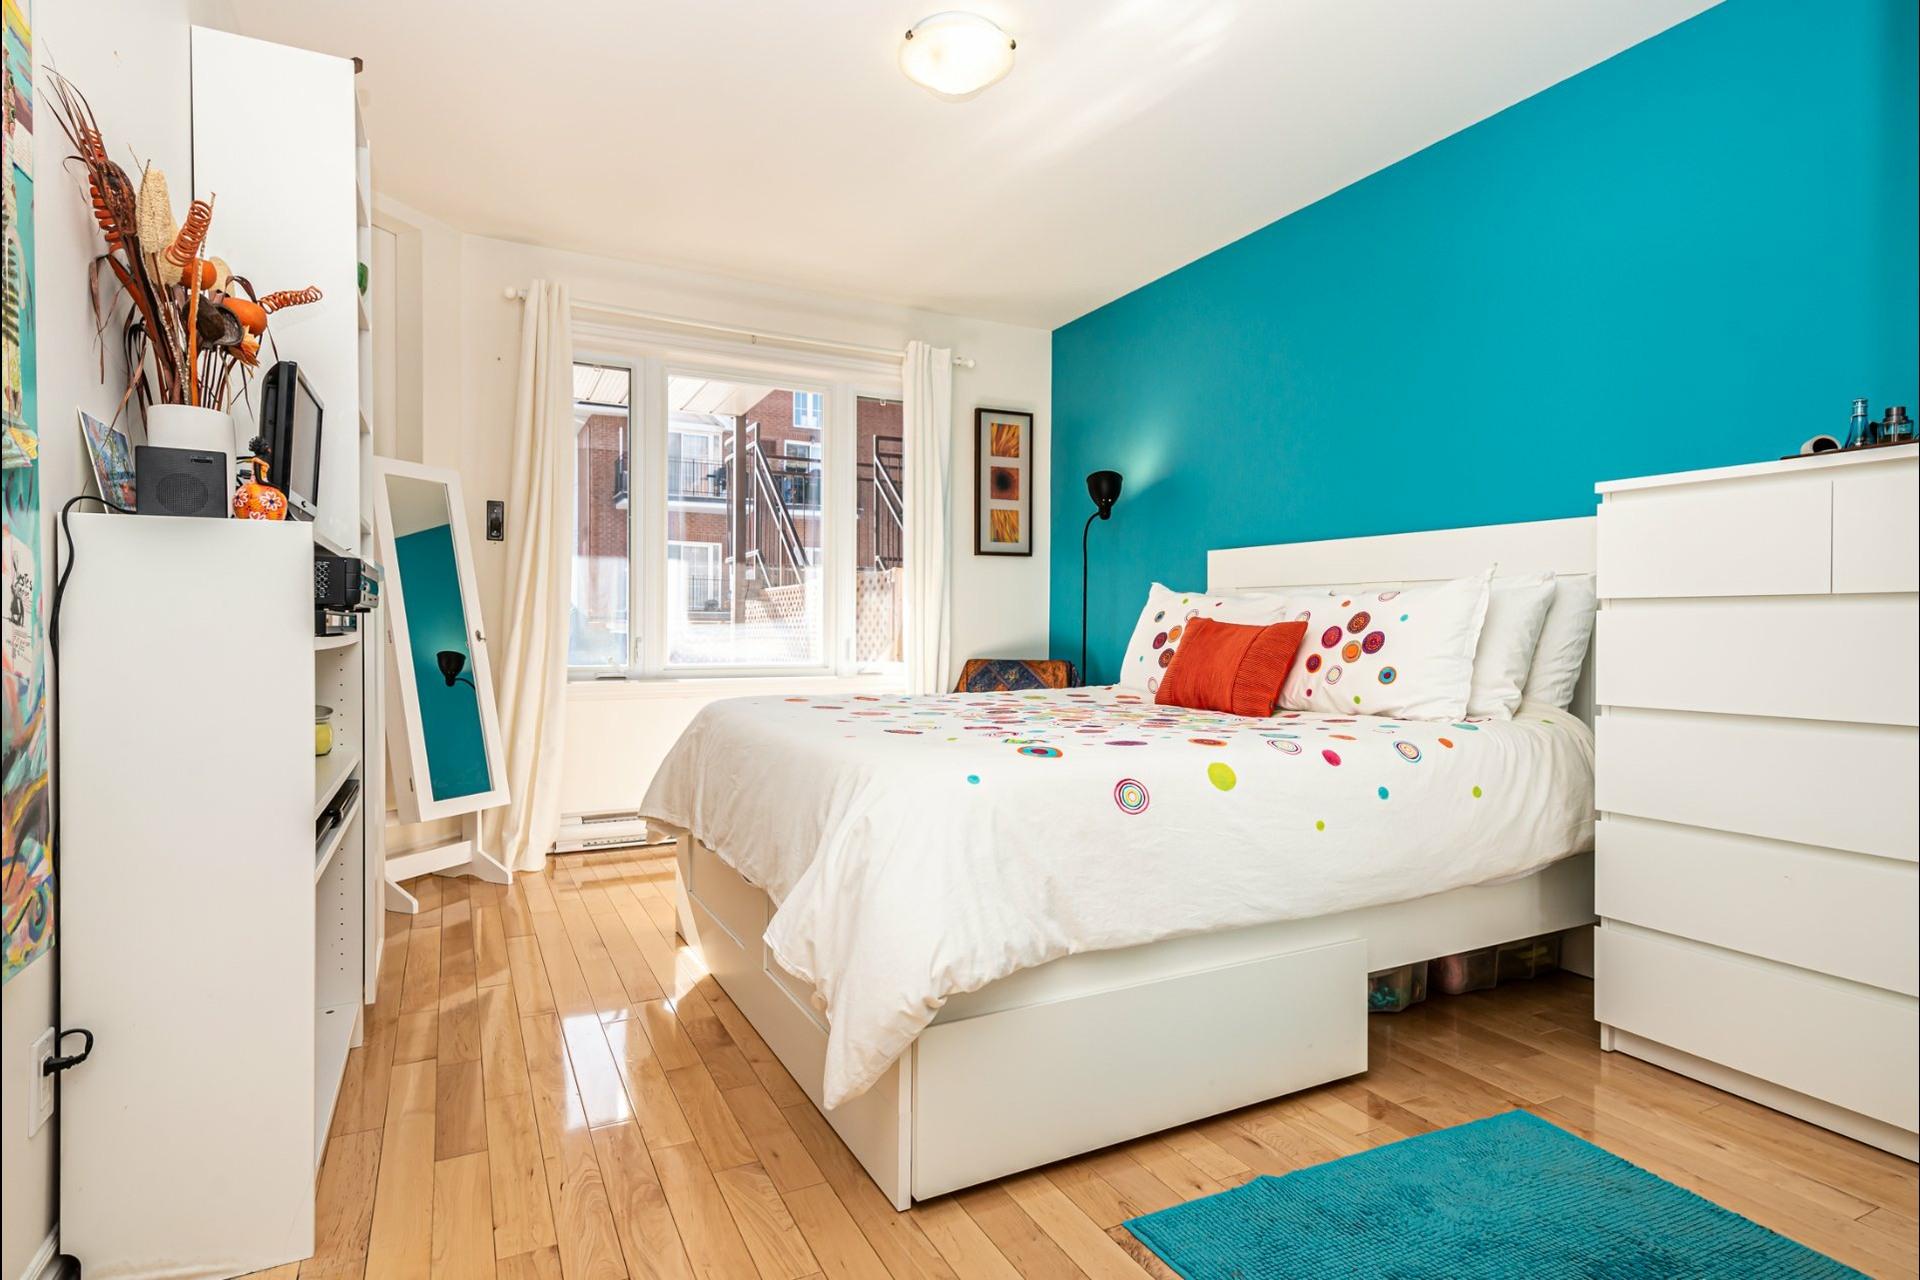 image 12 - Departamento En venta Saint-Laurent Montréal  - 4 habitaciones